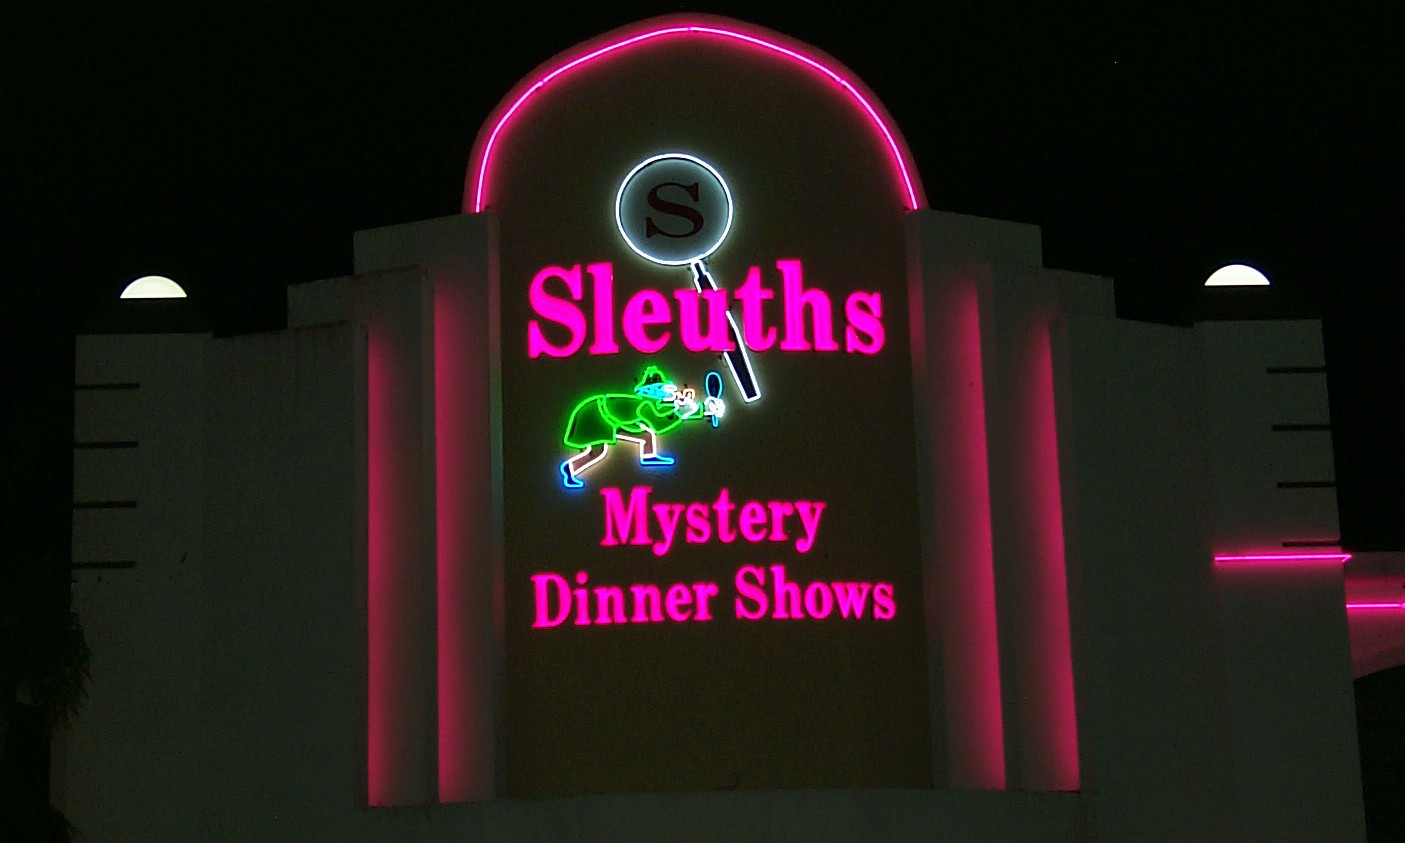 Mystery Dinner Show  Sleuths Mystery Dinner Shows